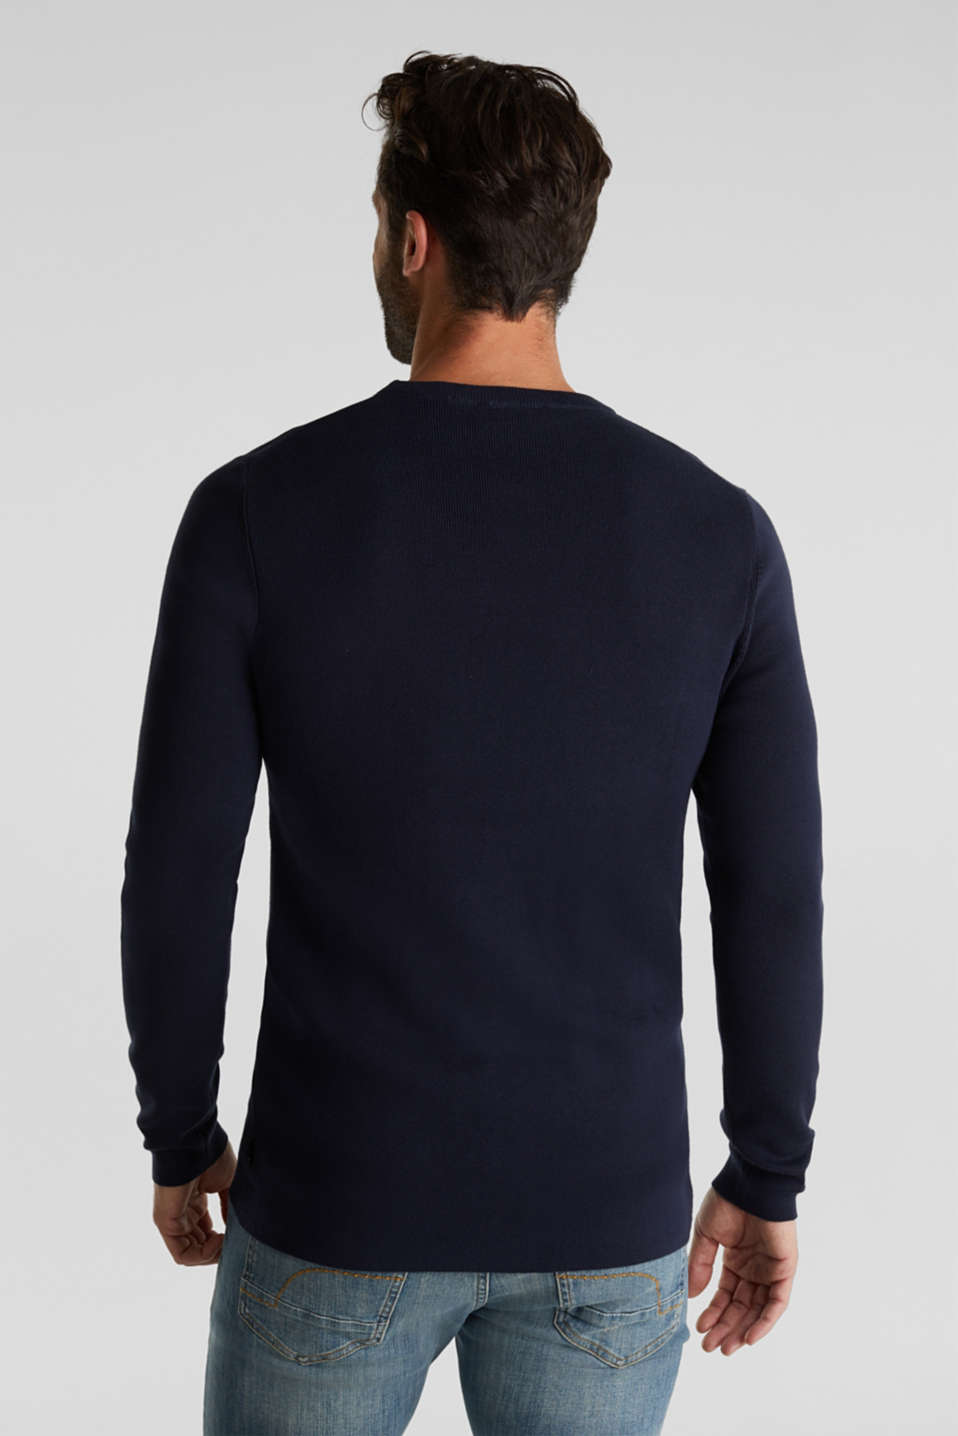 Logo jumper made of 100% cotton, NAVY 2, detail image number 3